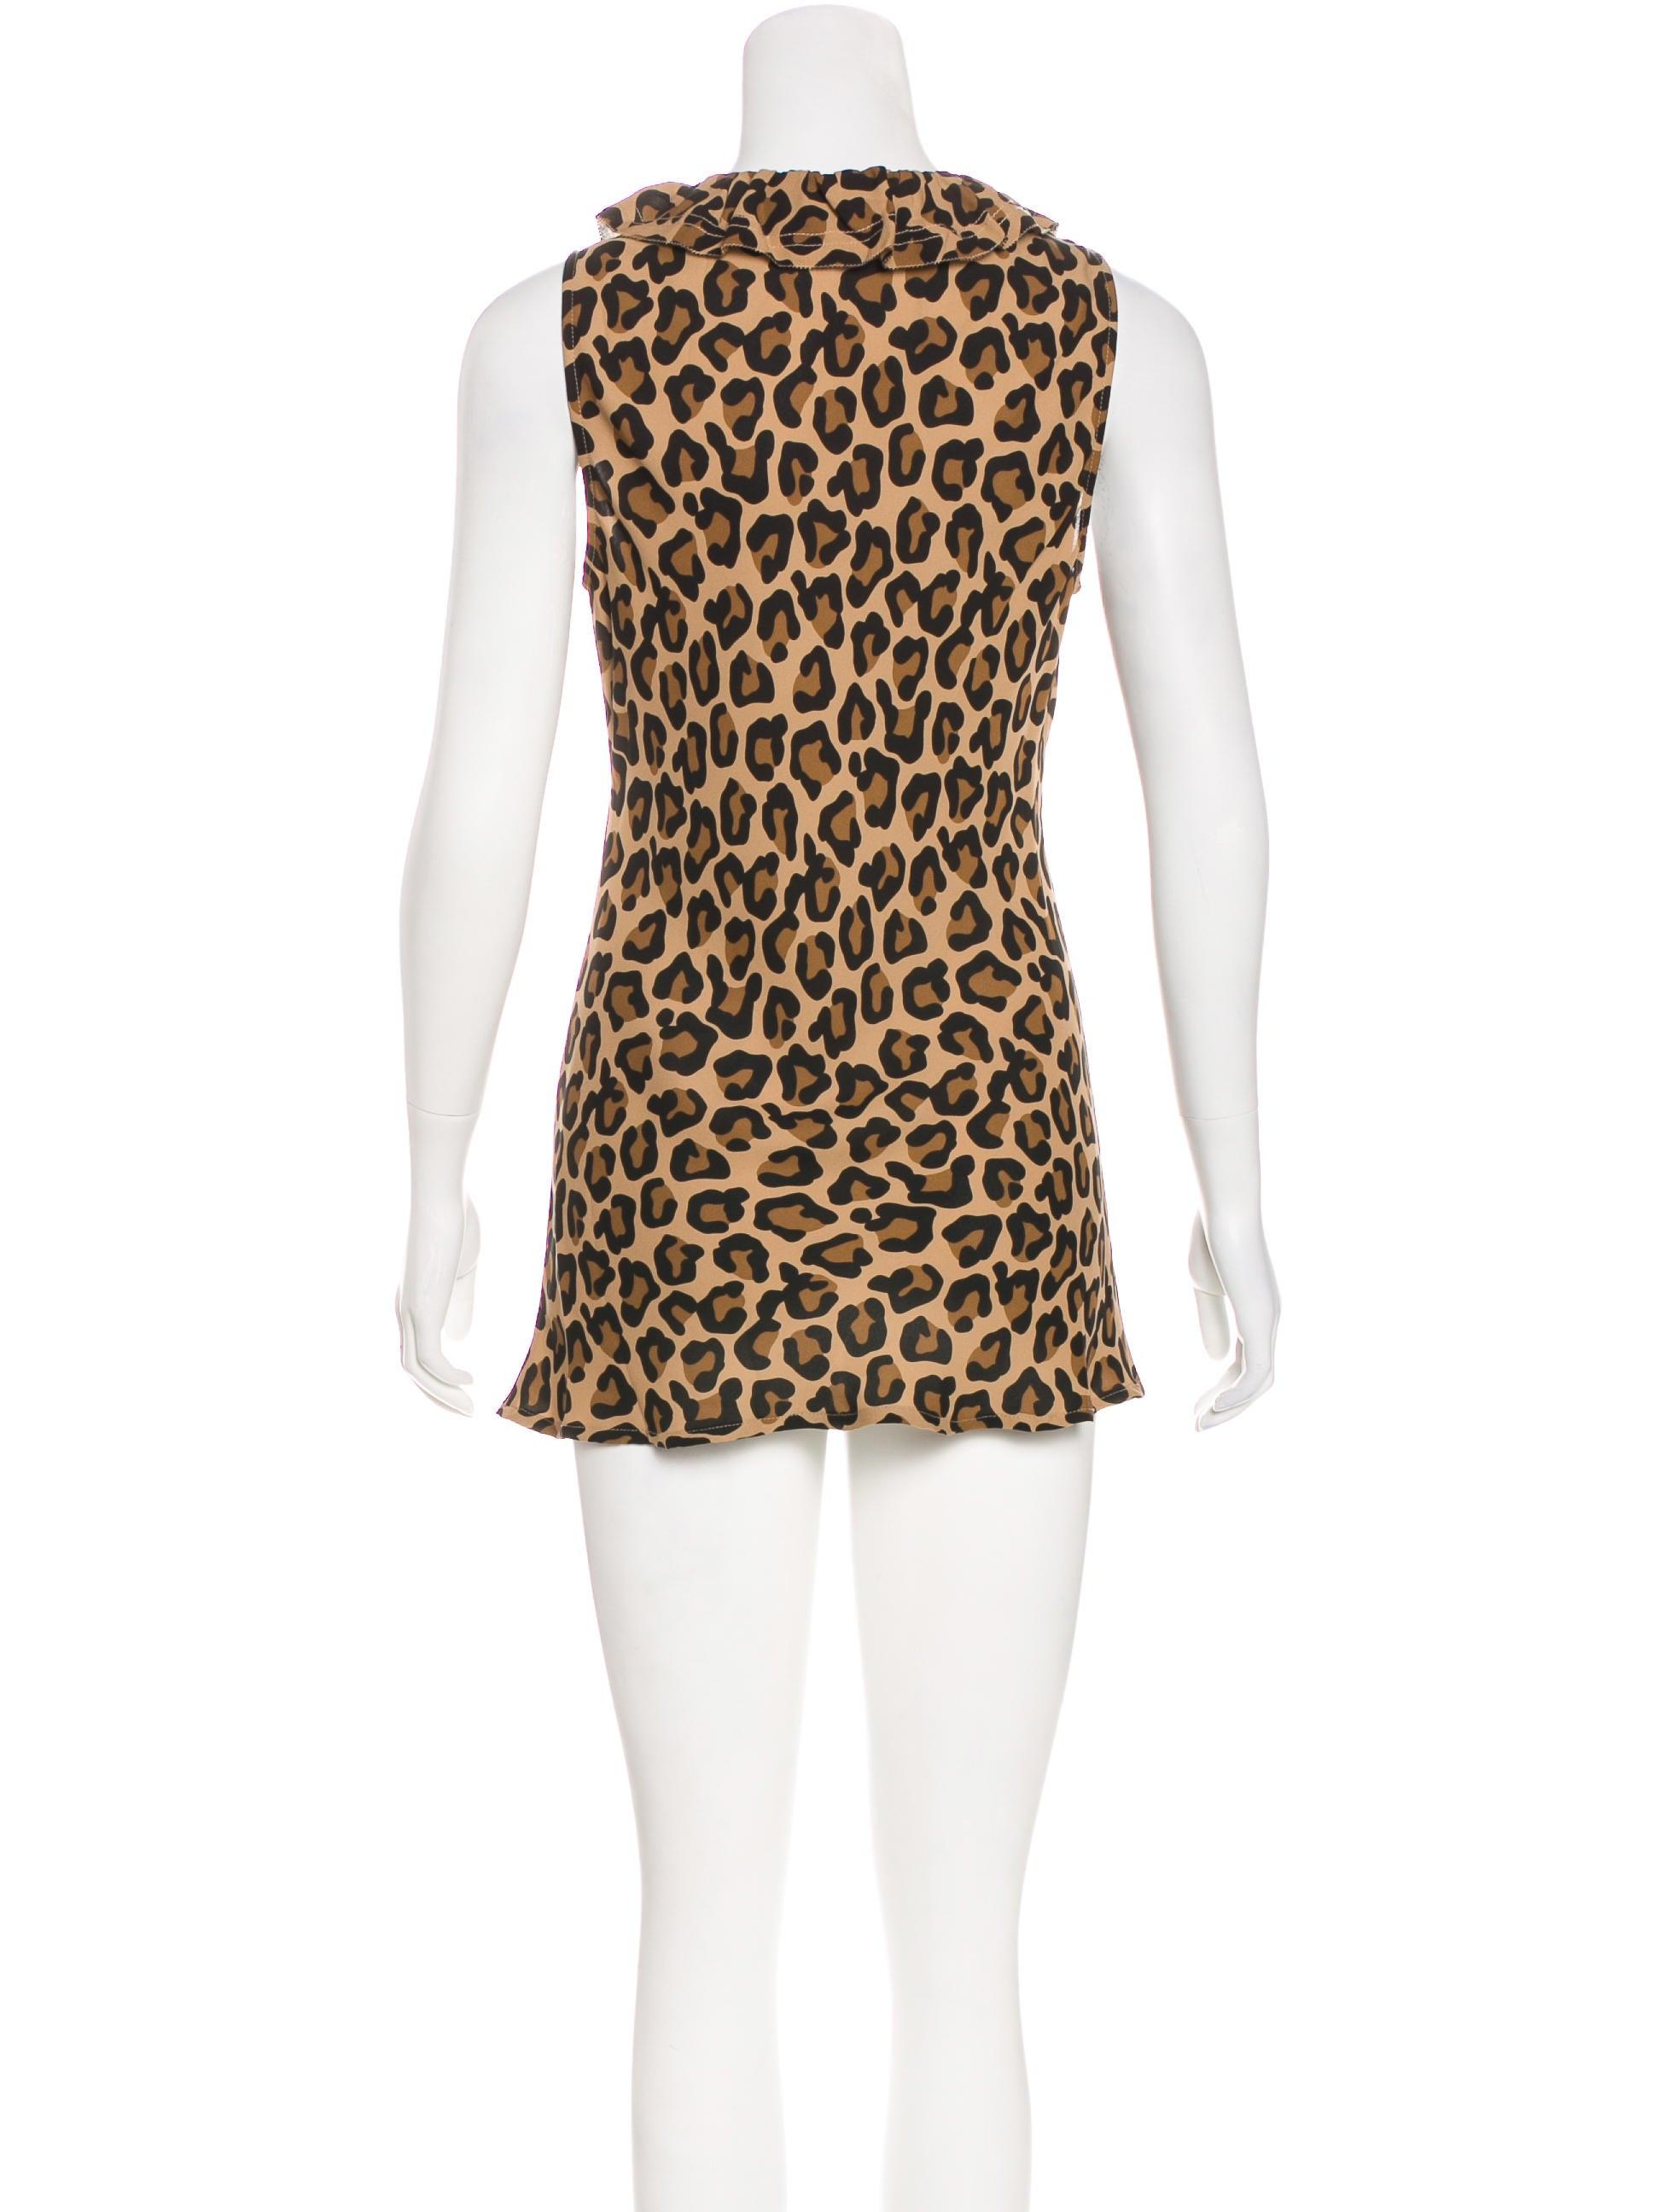 2487cc3ec2a1b5 Tory Burch Ruffled Silk Top - Clothing - WTO121924